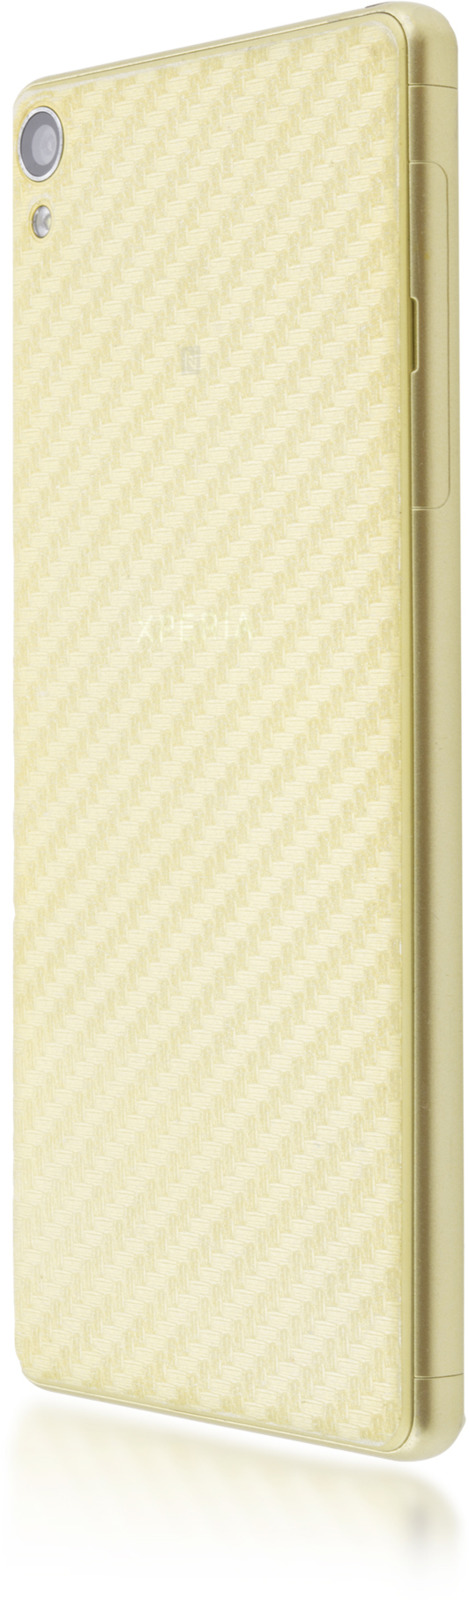 Декоративная пленка Brosco для Sony Xperia XA пленка стикер защитная кухня самоклеющаяся 75 45см пэт мультидом